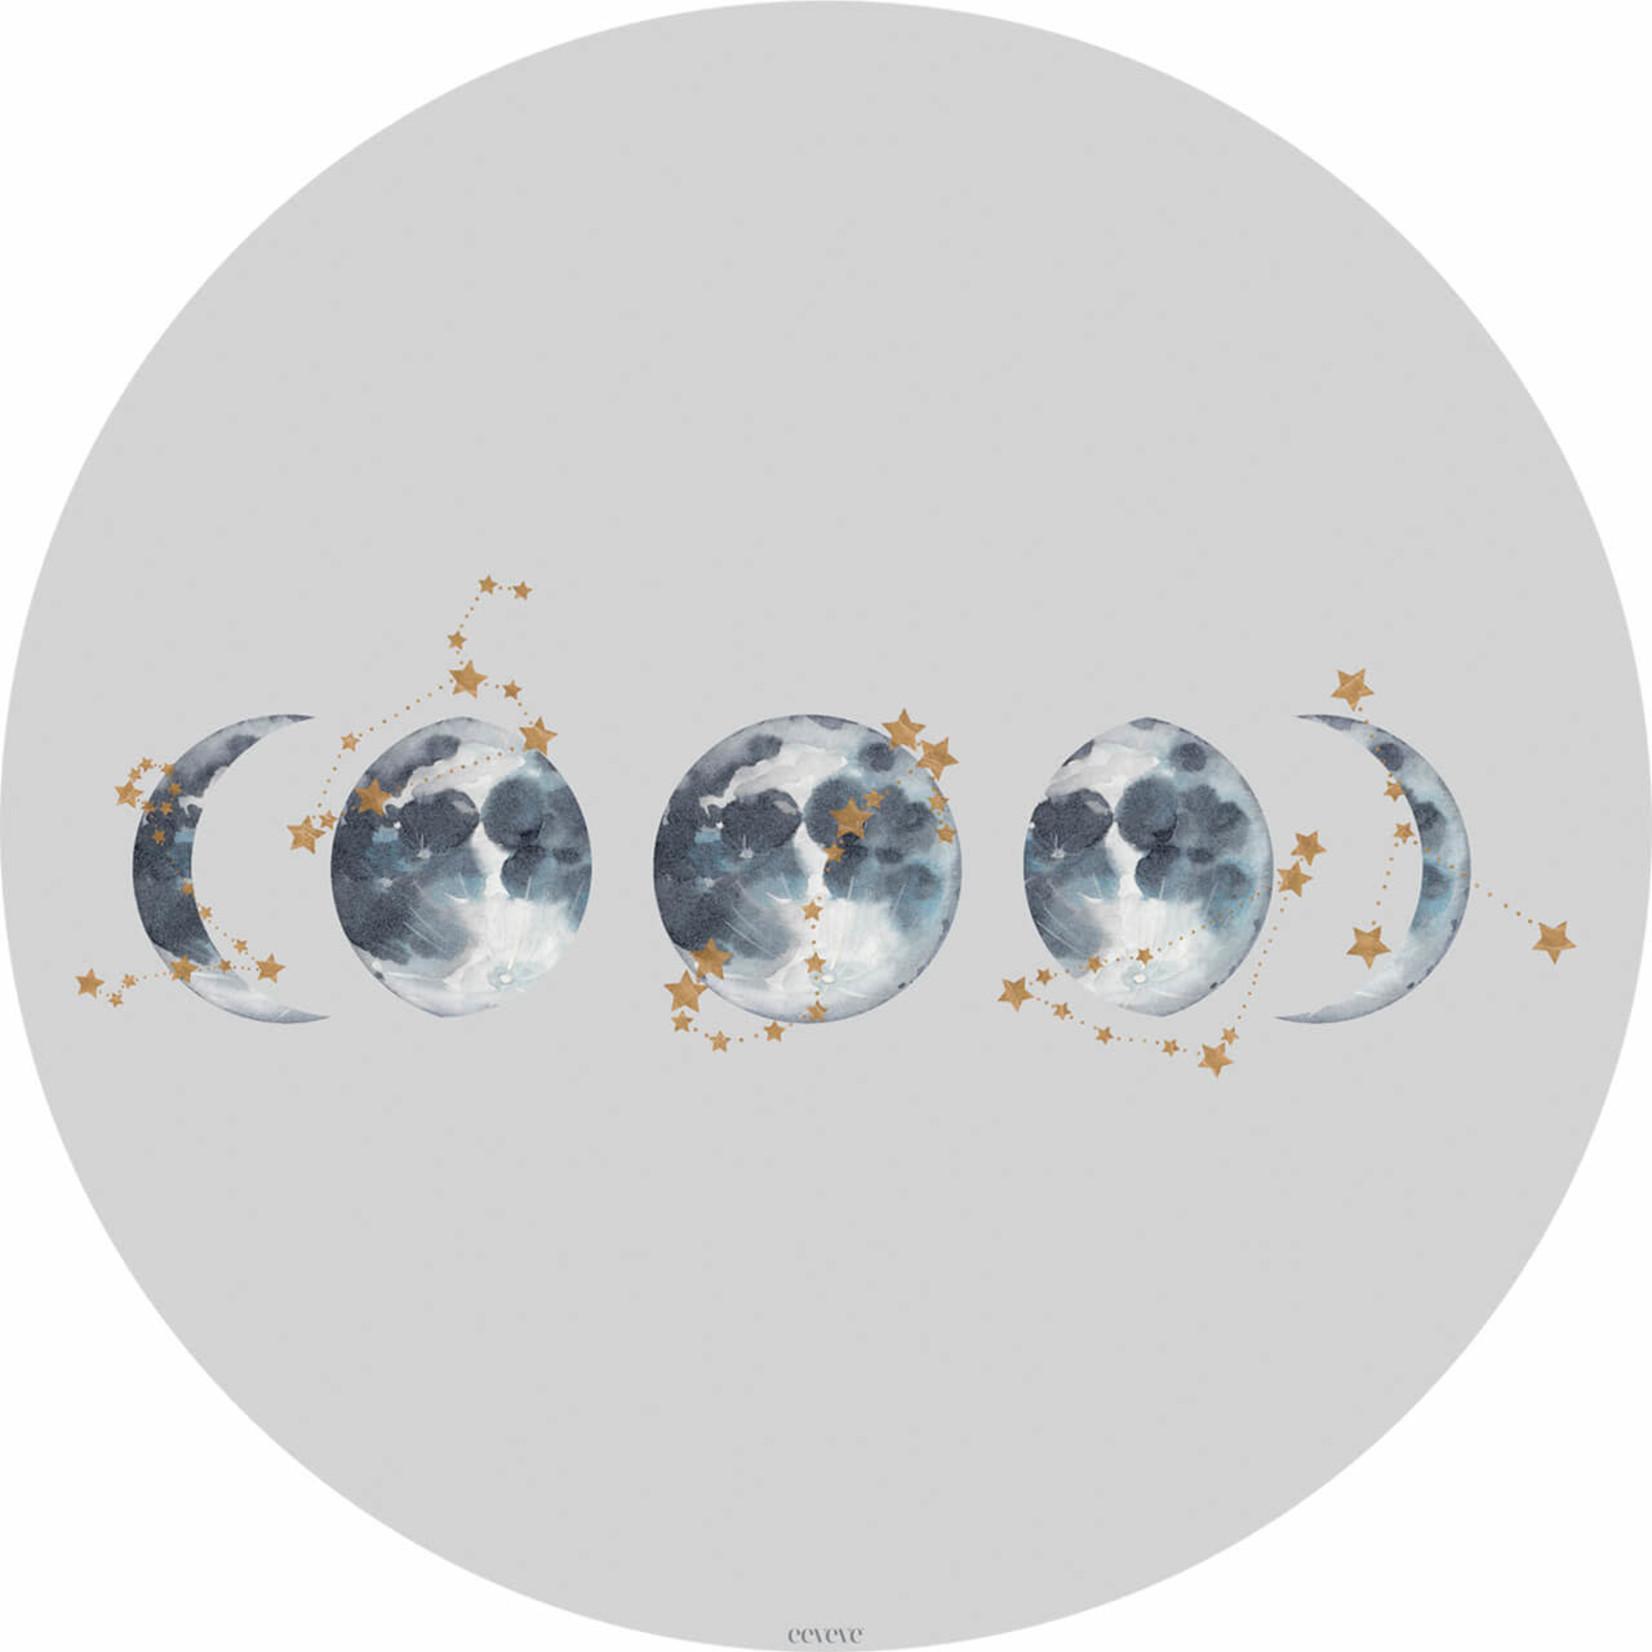 Eeveve Eeveve Round Splash Mat Lunar Eclipse - Light gray